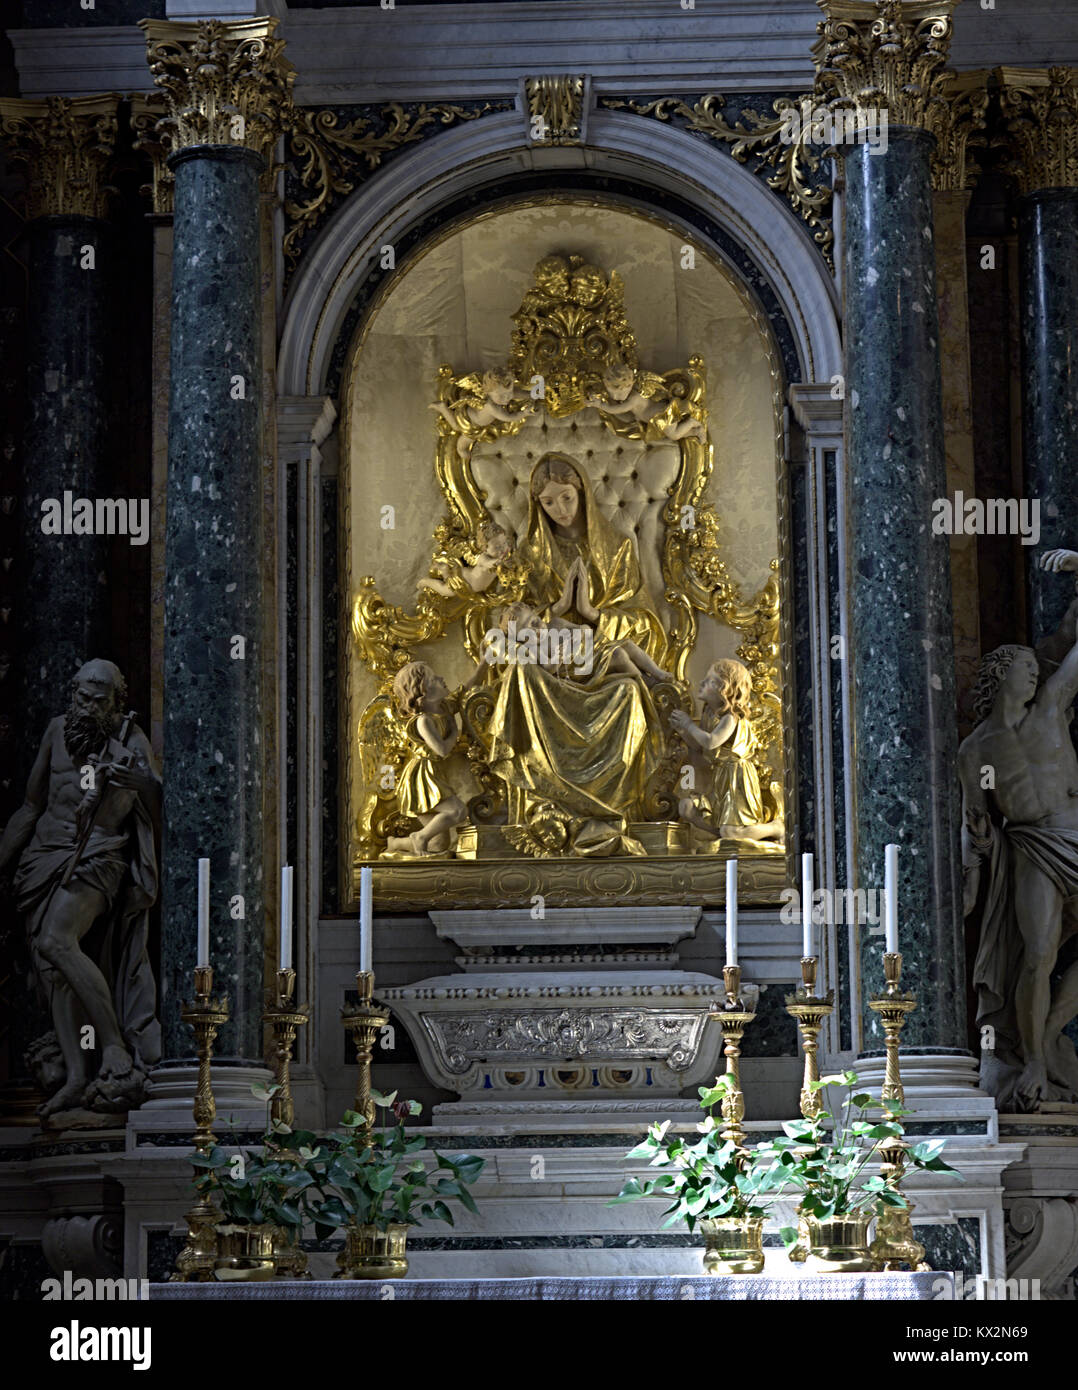 Verona Veneto Italy. Santa Maria Matricolare cathedral. Madonna del popolo chapel detail. Commissioned by canonical - Stock Image